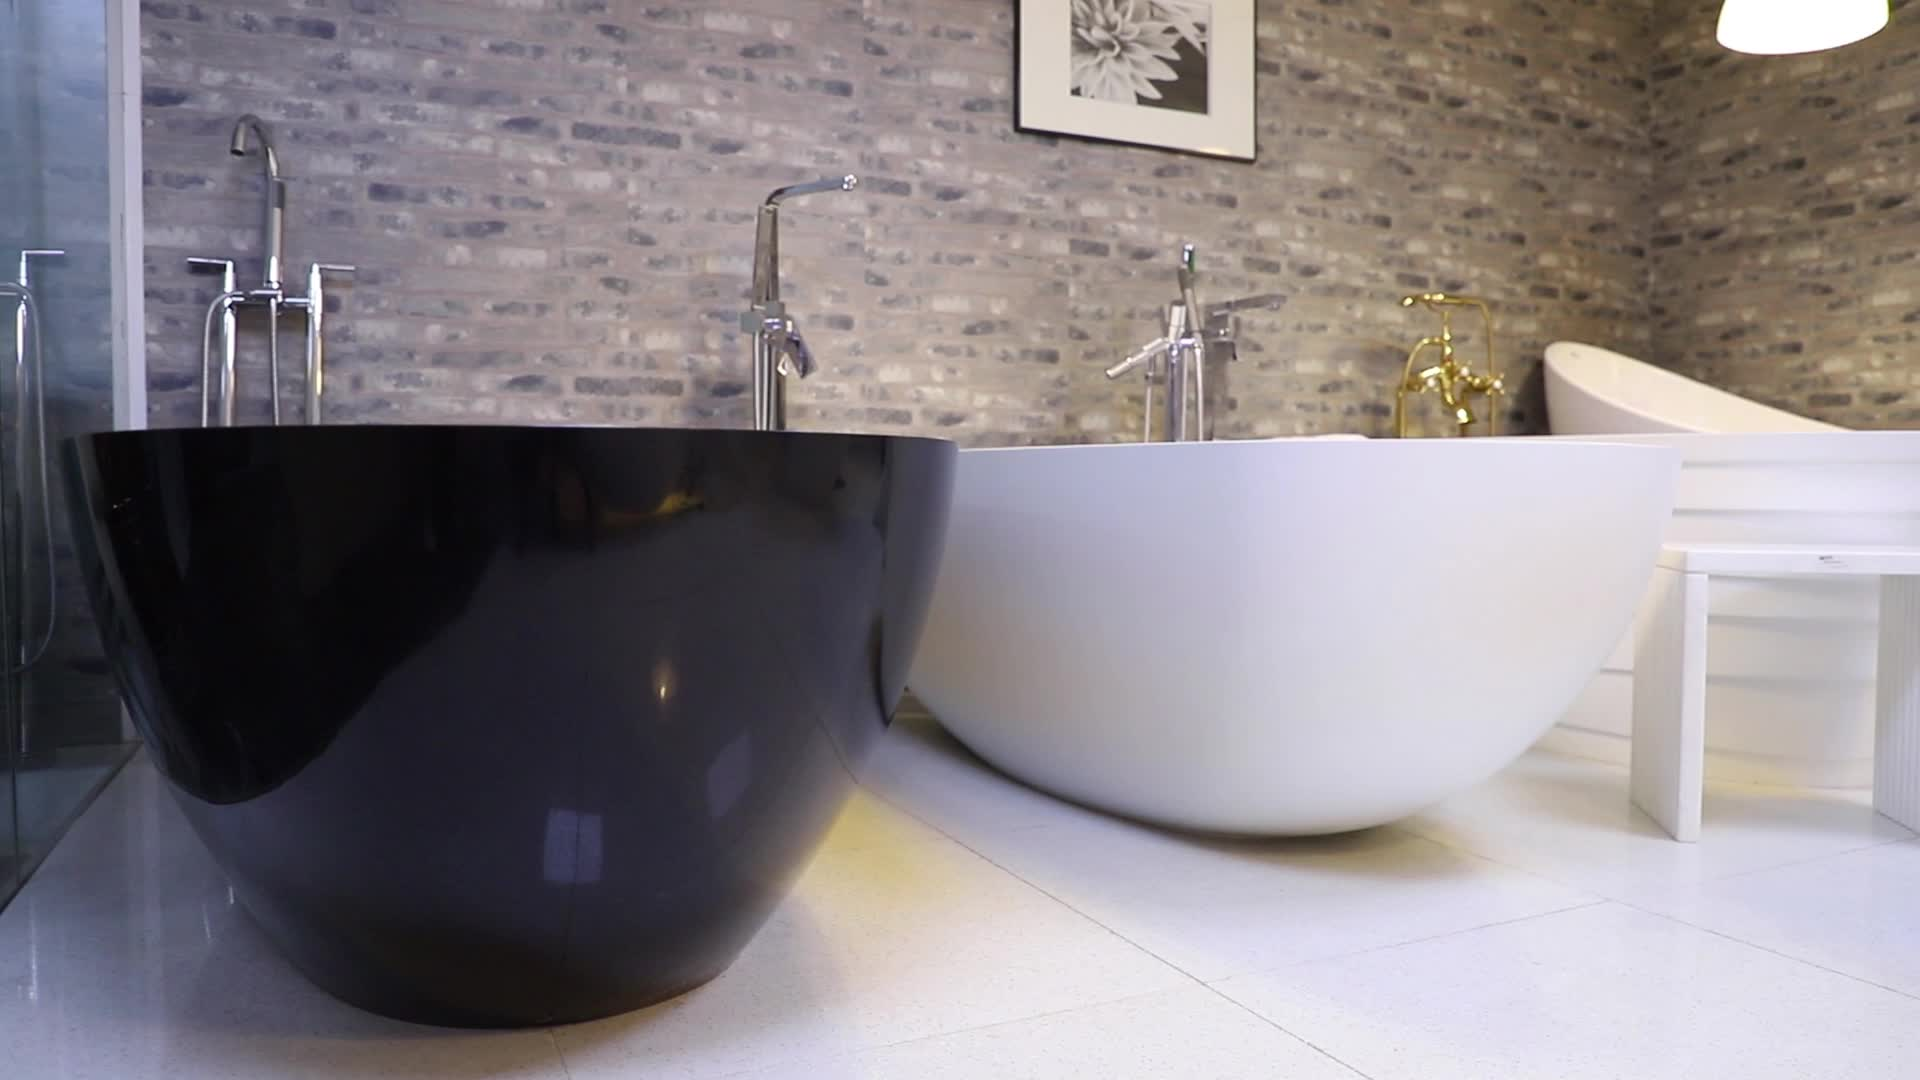 KKR ยี่ห้อใหม่สีดำอ่างอาบน้ำ Freestanding รูปไข่ Stand Alone อะคริลิค Solid Surface Bath Tub